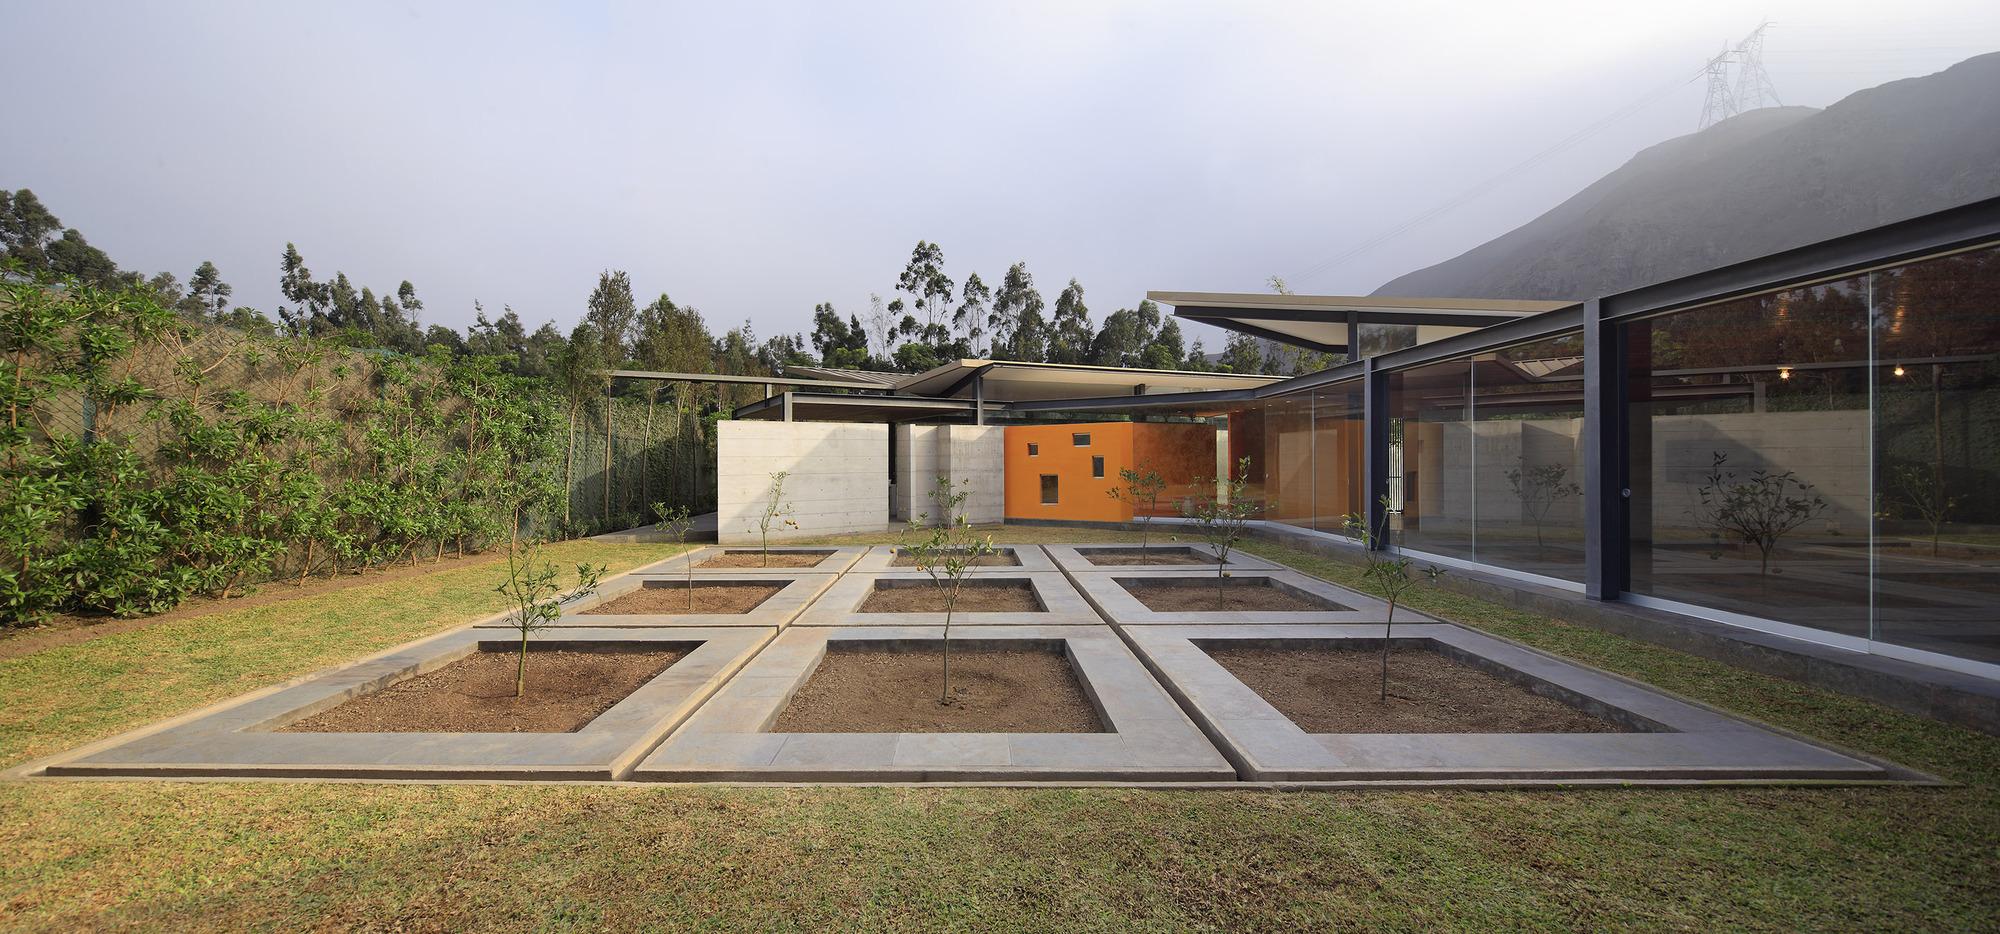 Campo Oeste House / Poggione + Biondi Arquitectos